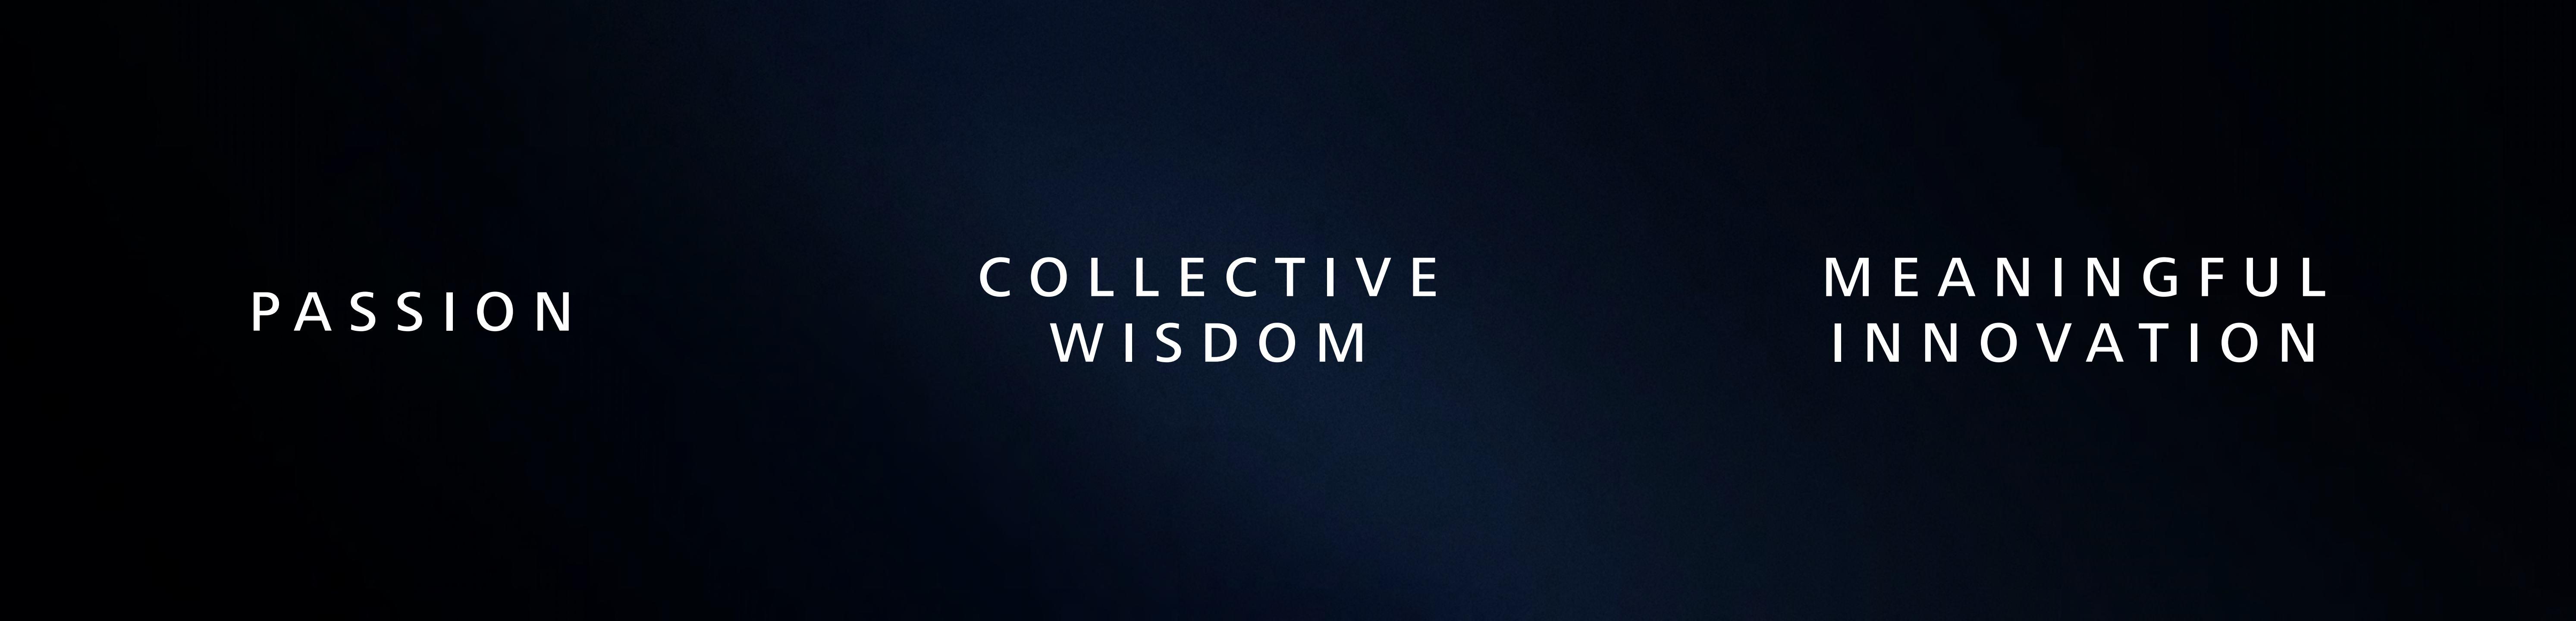 passion-wisdom-innovation